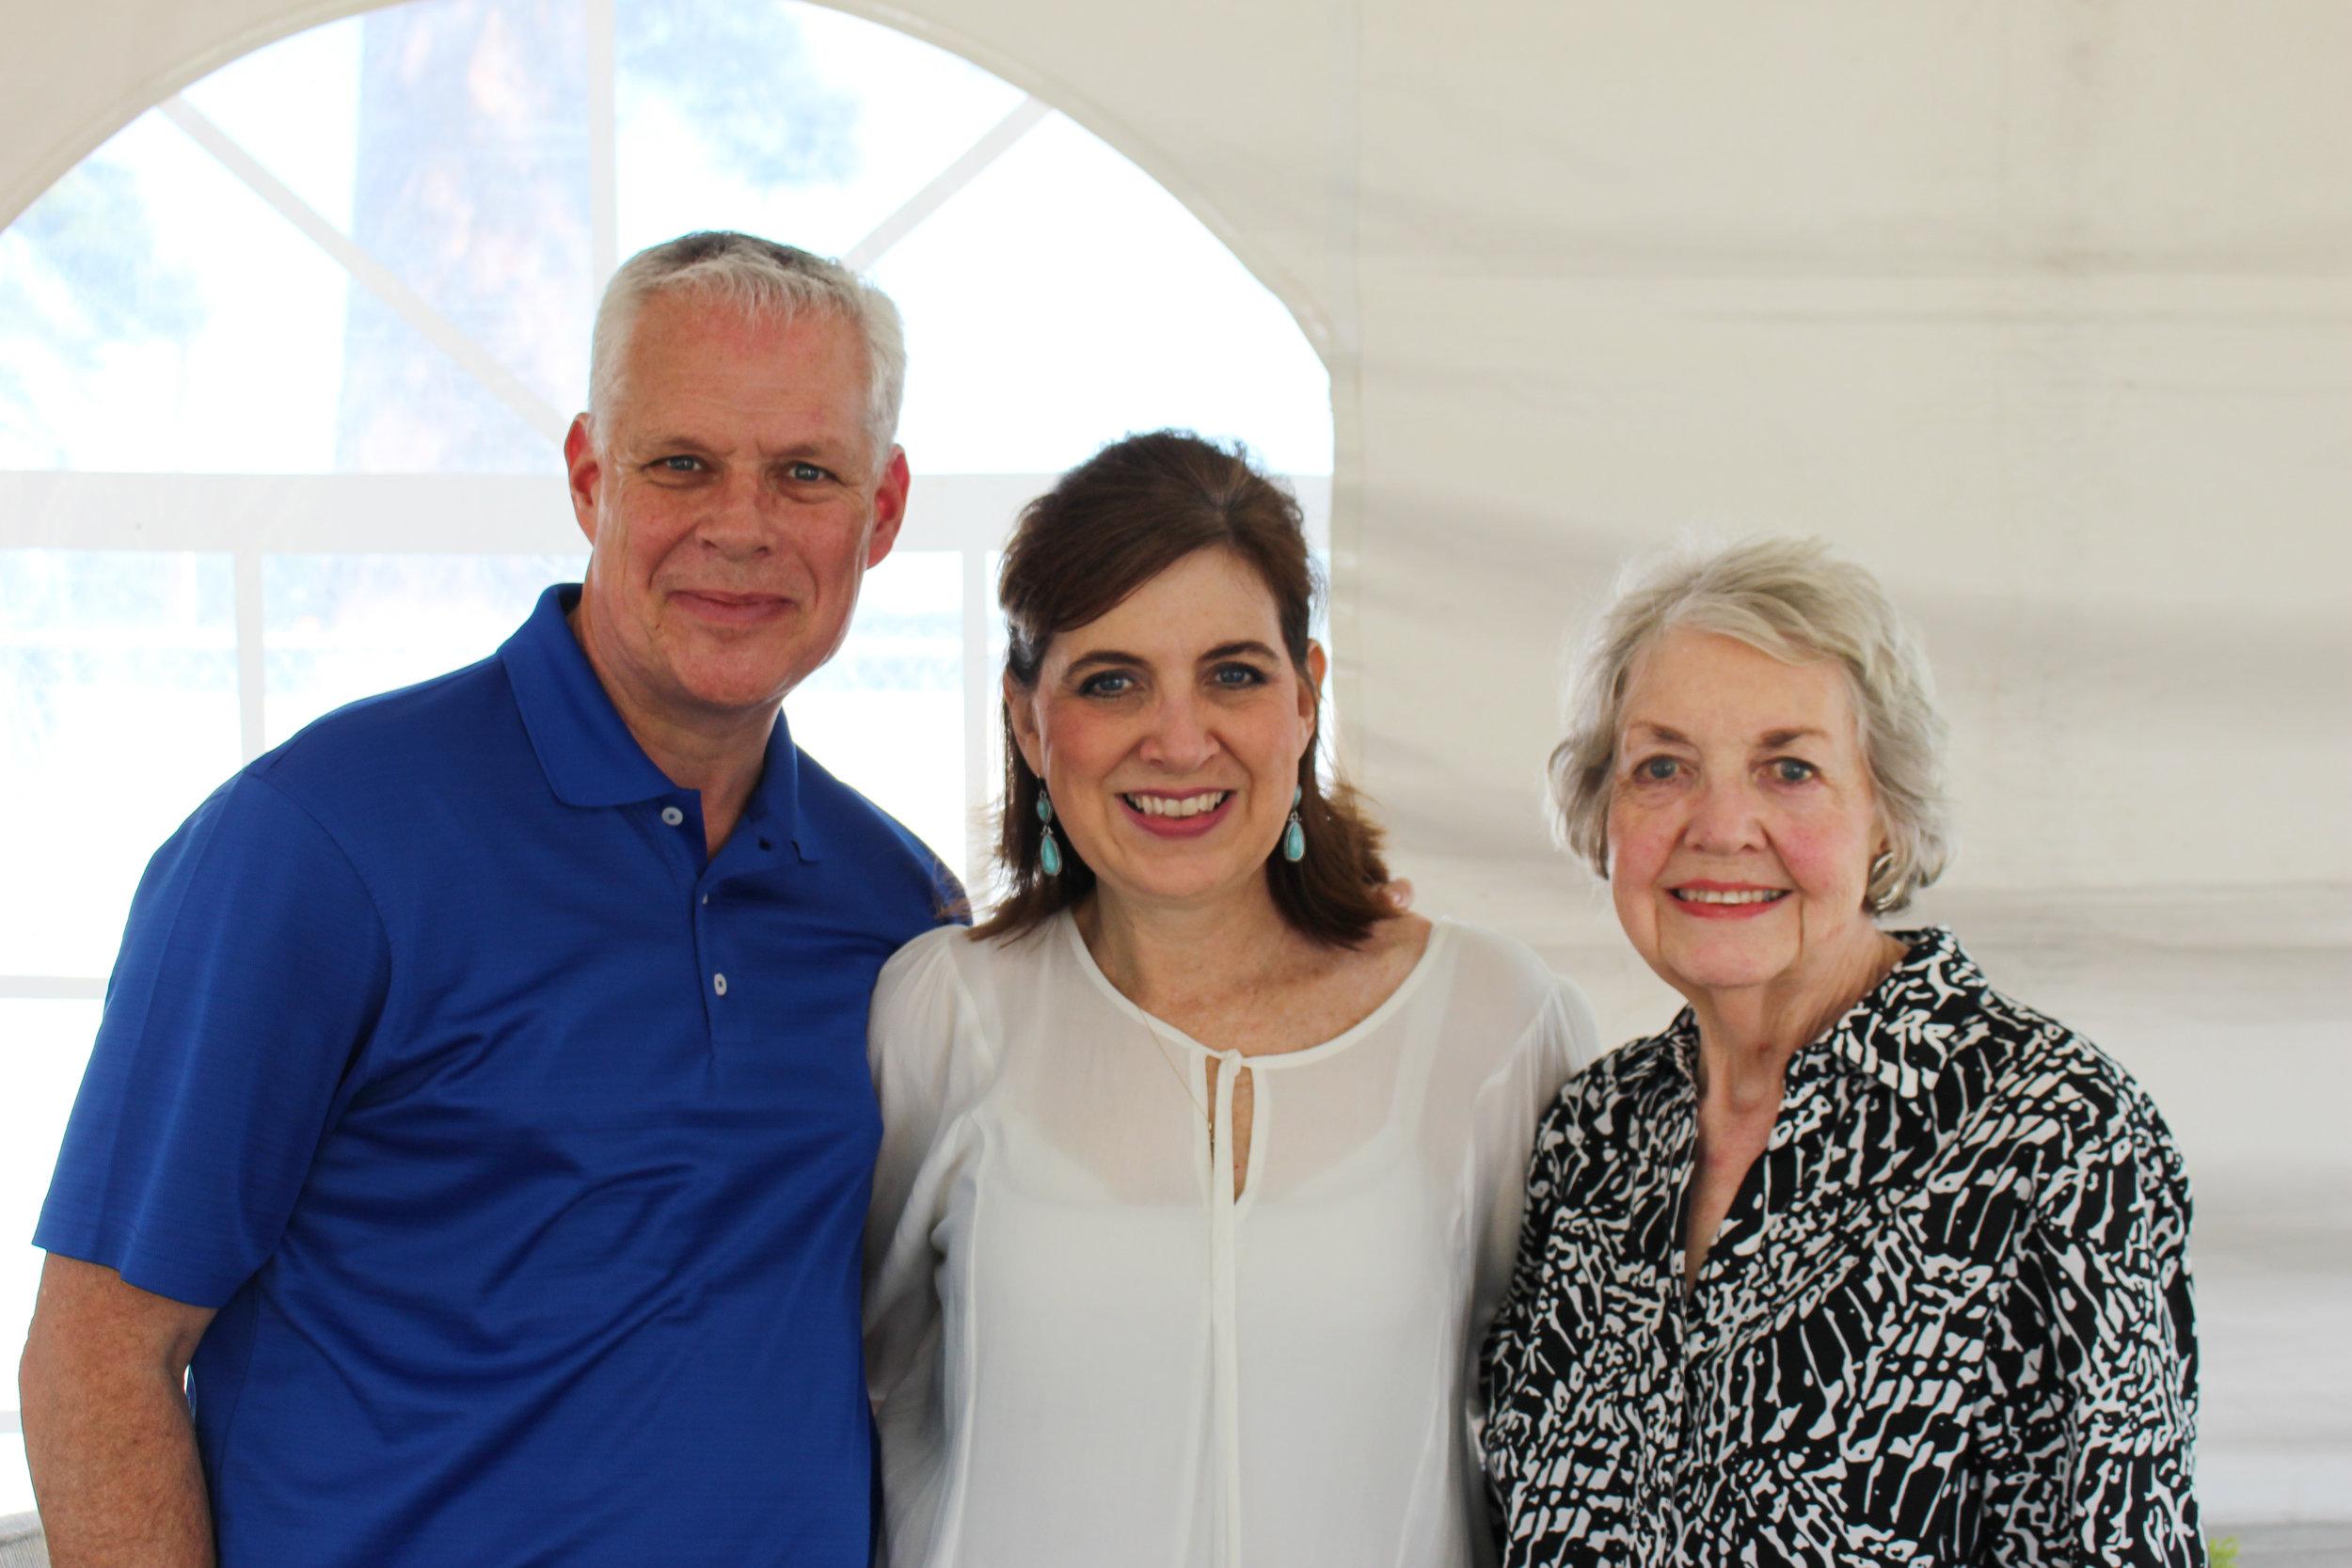 Robert and Suzy Irwin with Barbara Carl